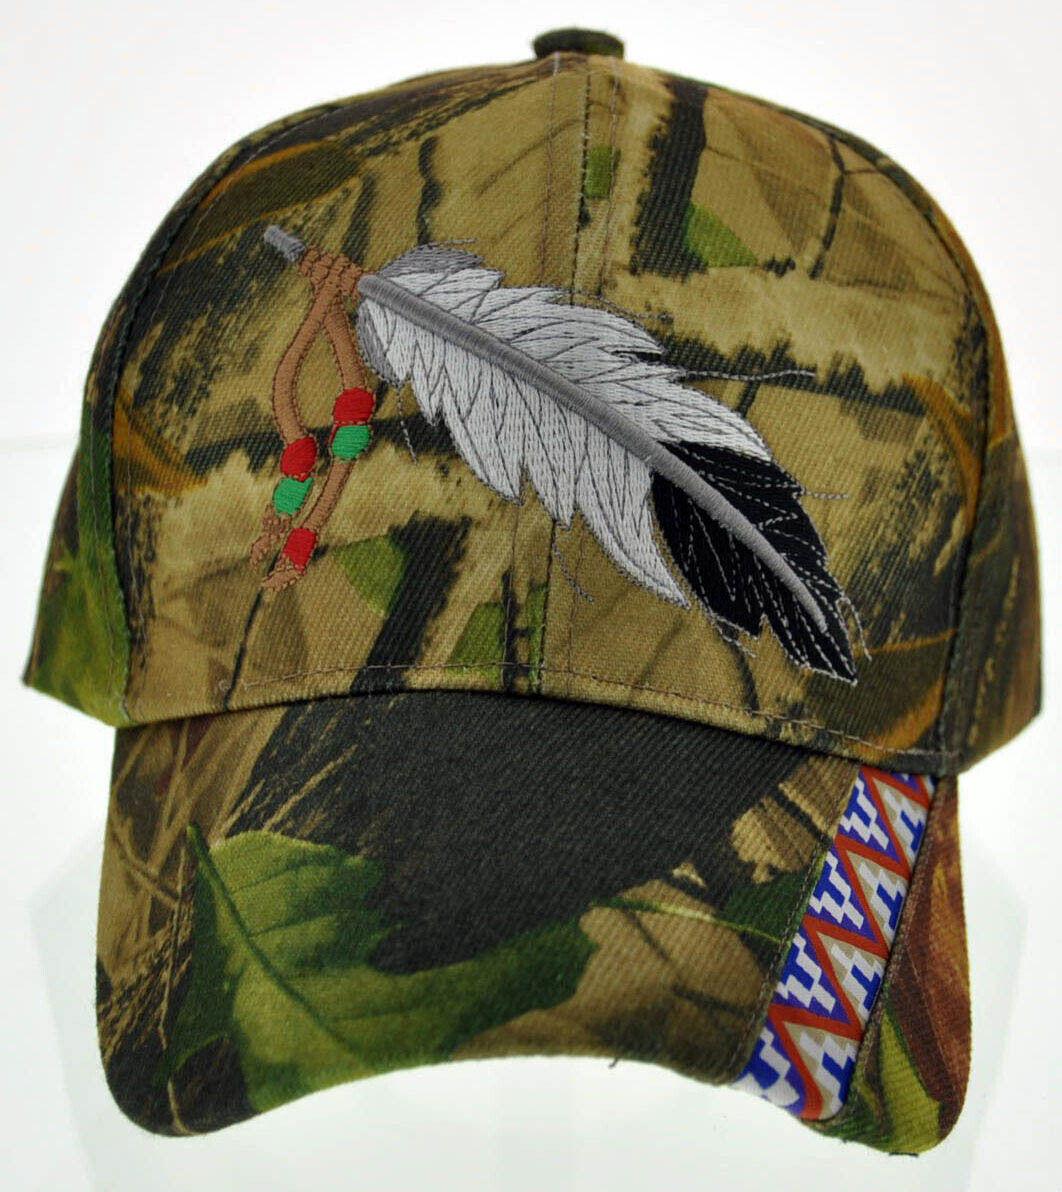 ! nuevo! orgullo Indio Nativo Plumas Grande lado americano Gorra Sombrero Camo